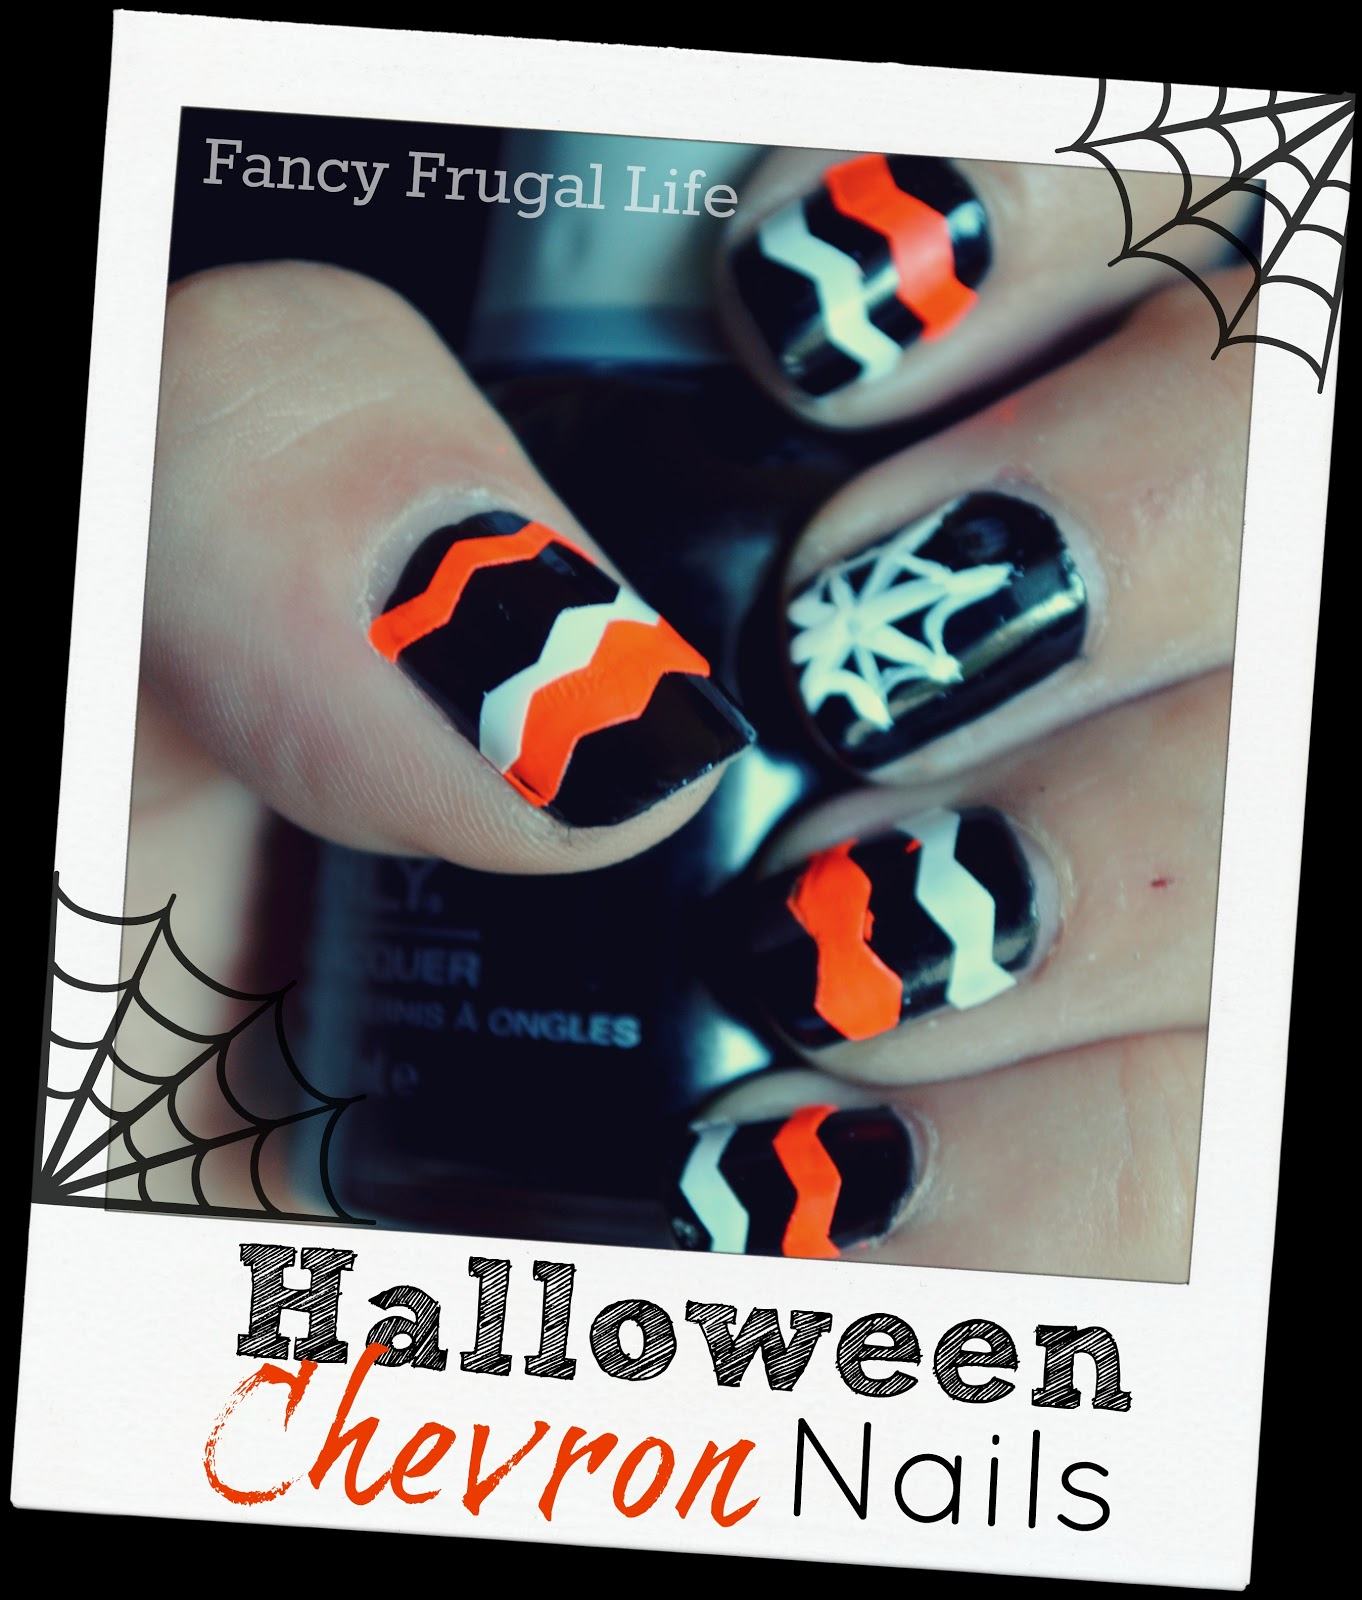 Diy halloween chevron nails easy halloween manicure diy halloween chevron nails easy halloween manicure solutioingenieria Choice Image